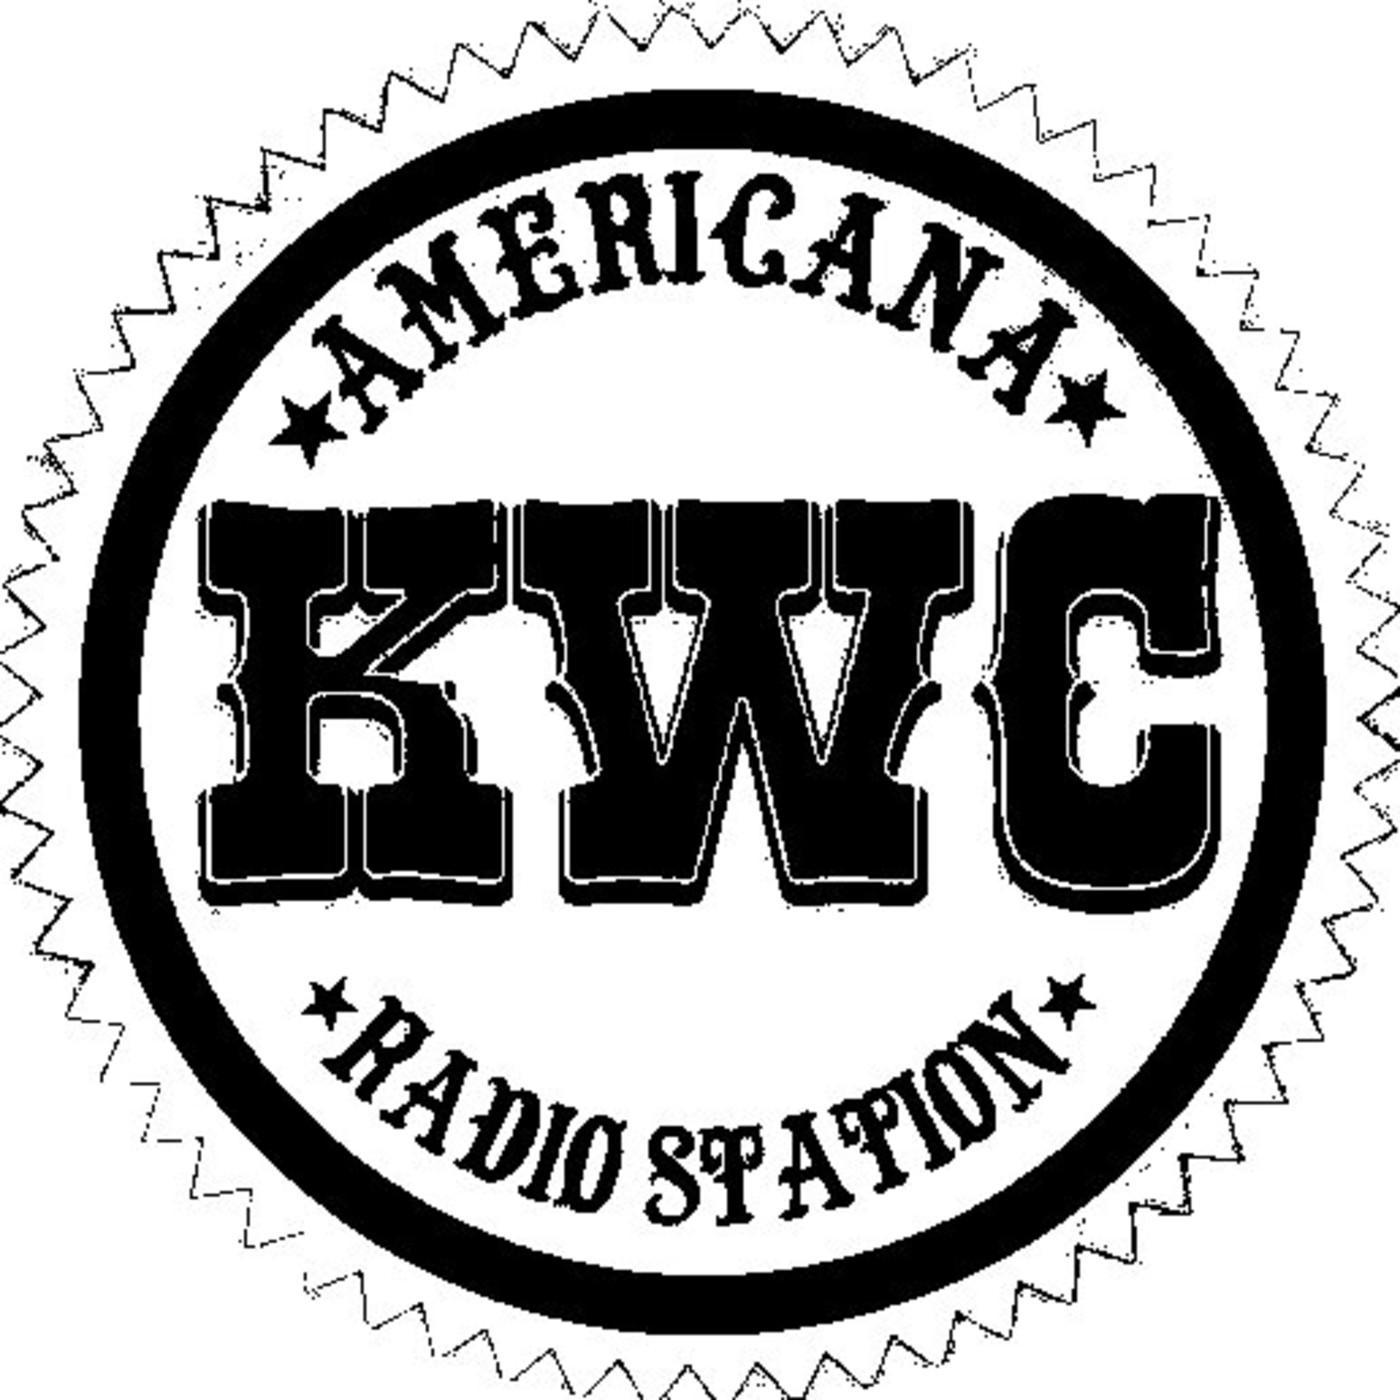 KWC - Crazy Rodeo - 58 - 2016-04-19